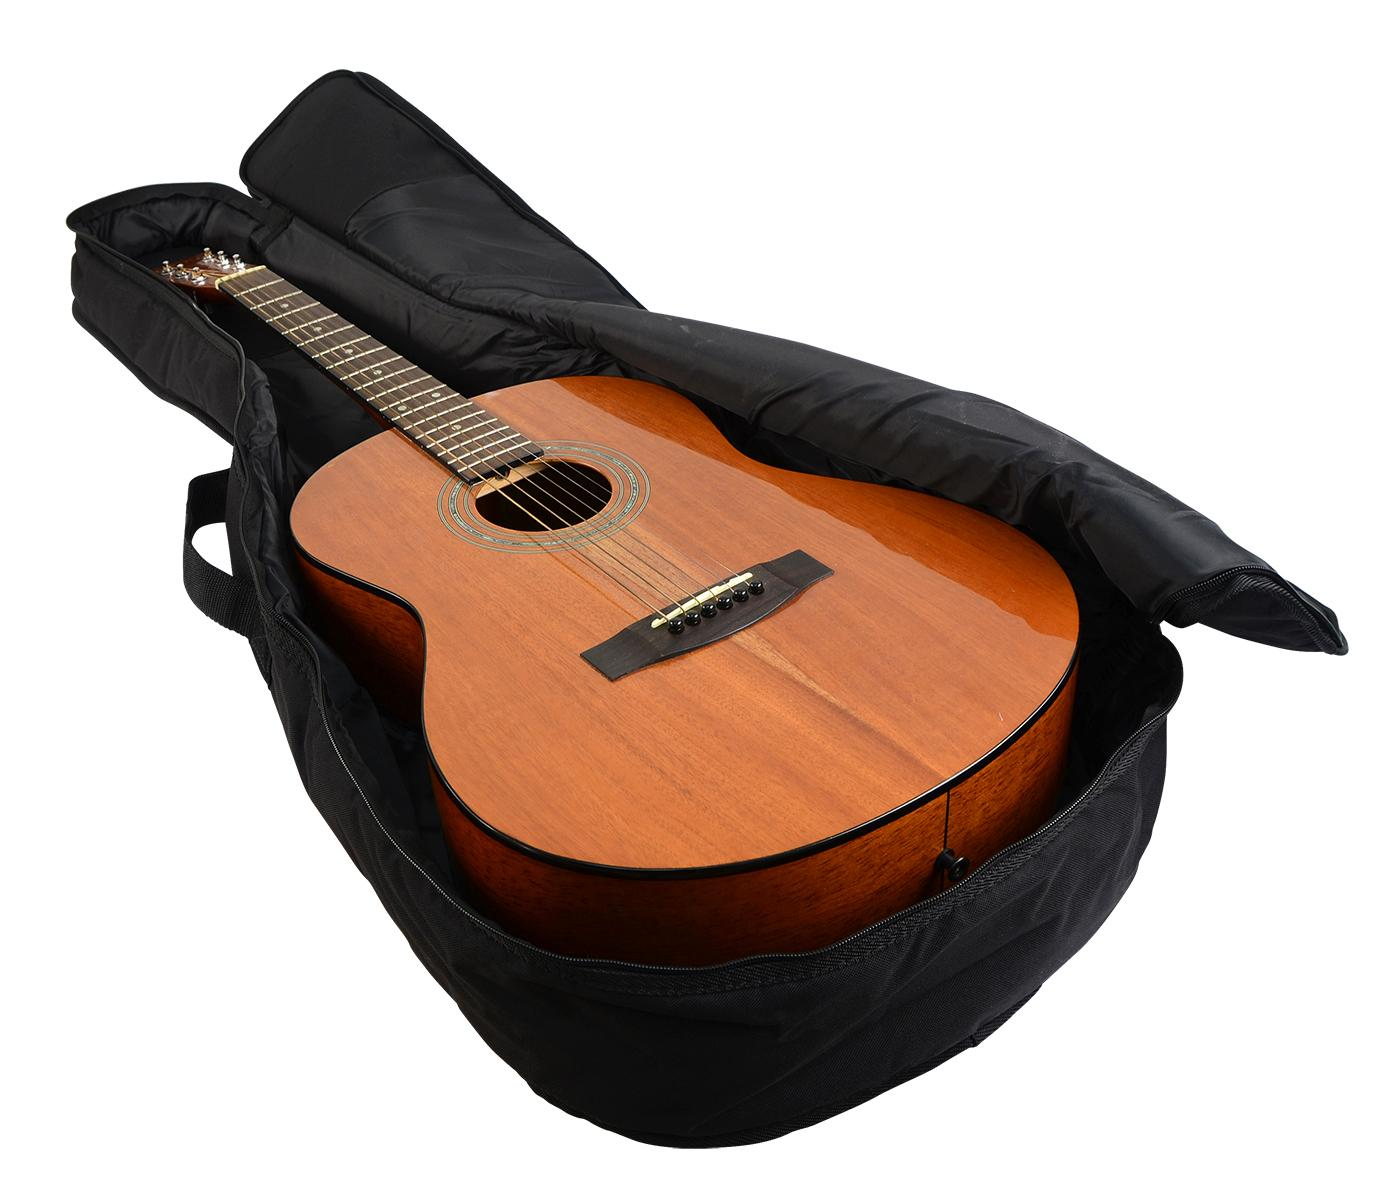 gator cases gig bag for dreadnought acoustic guitars gbe dread musical instruments. Black Bedroom Furniture Sets. Home Design Ideas